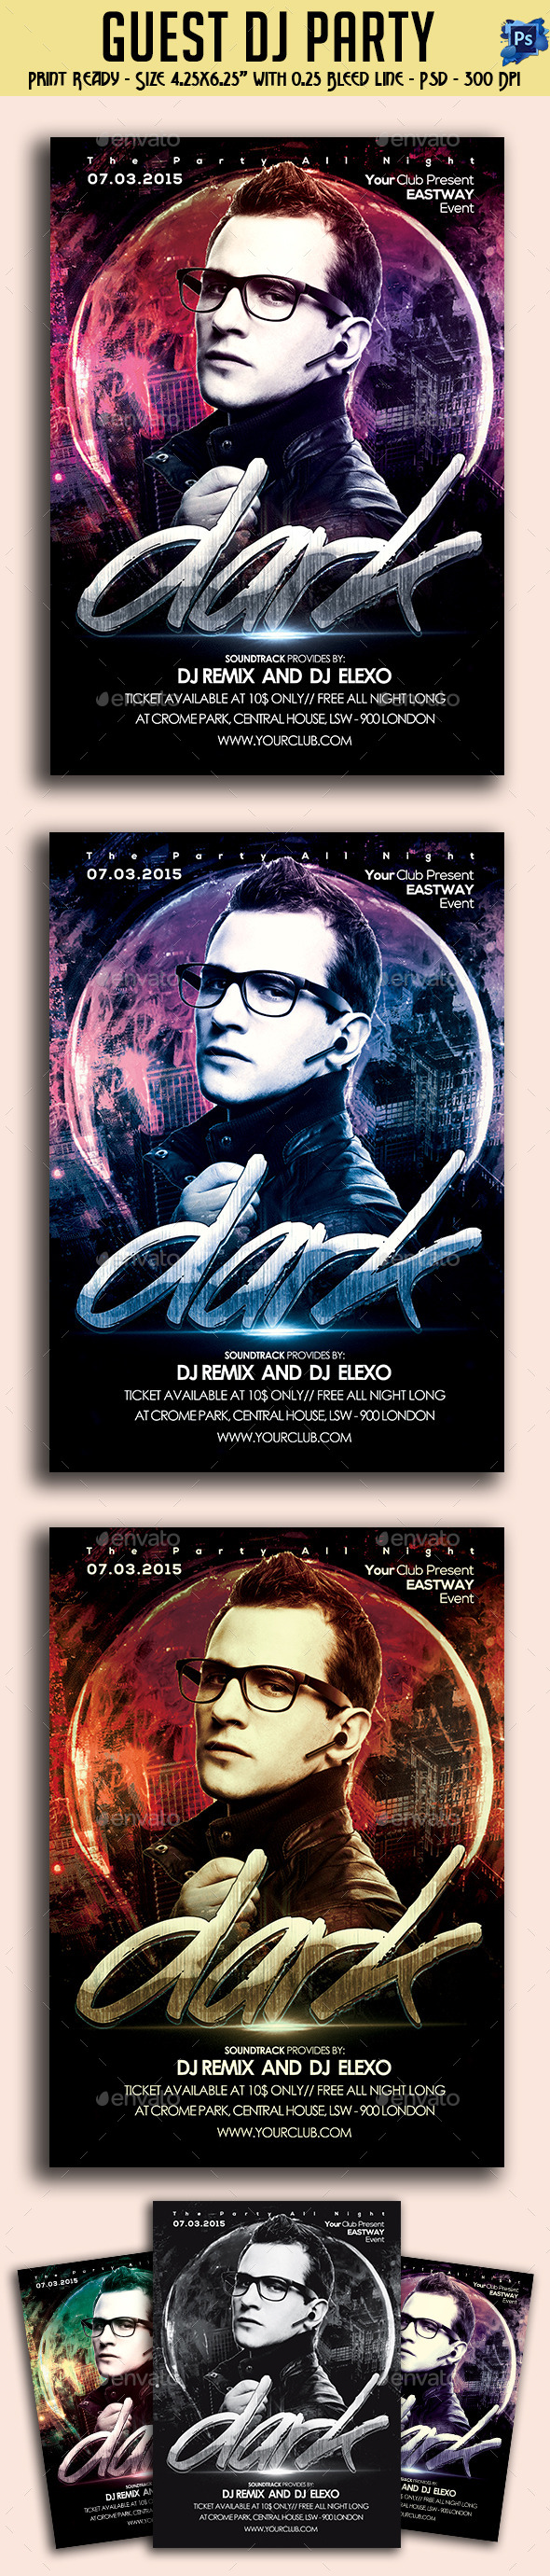 GraphicRiver Guest Dj Party Flyer 10951950